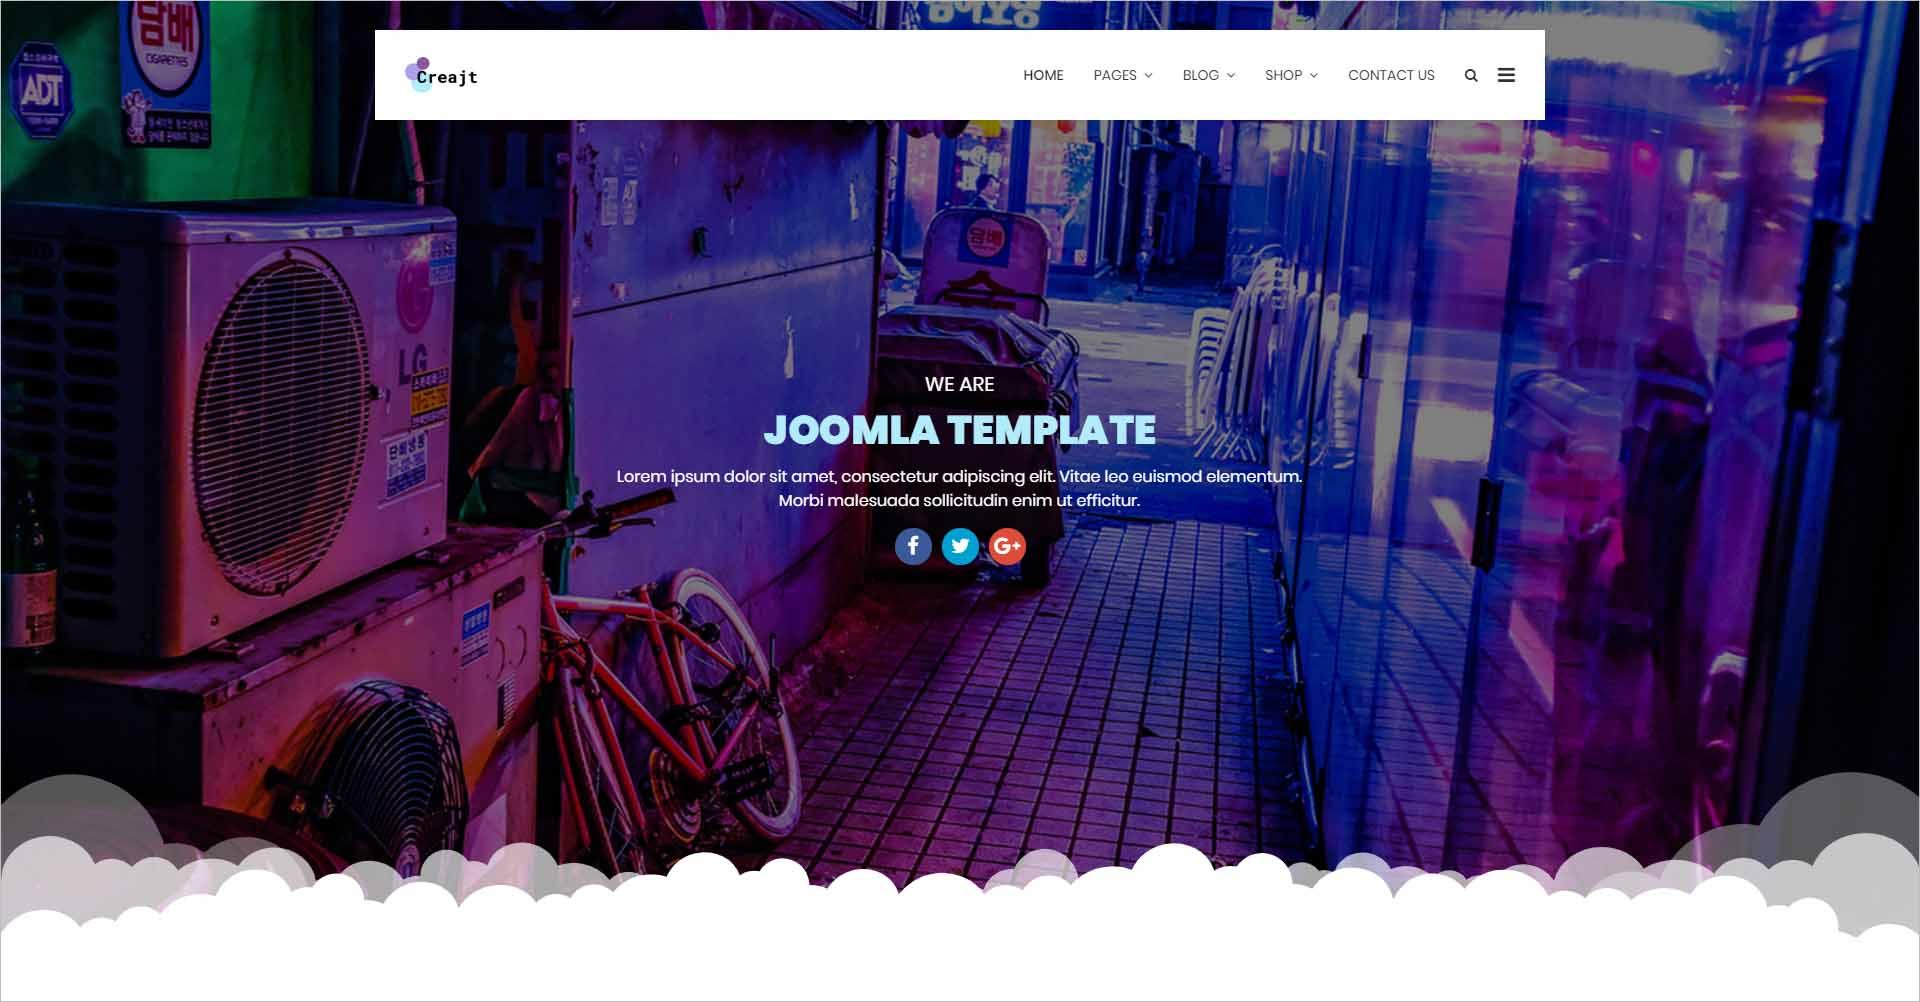 Creajt Business Agency Joomla Template